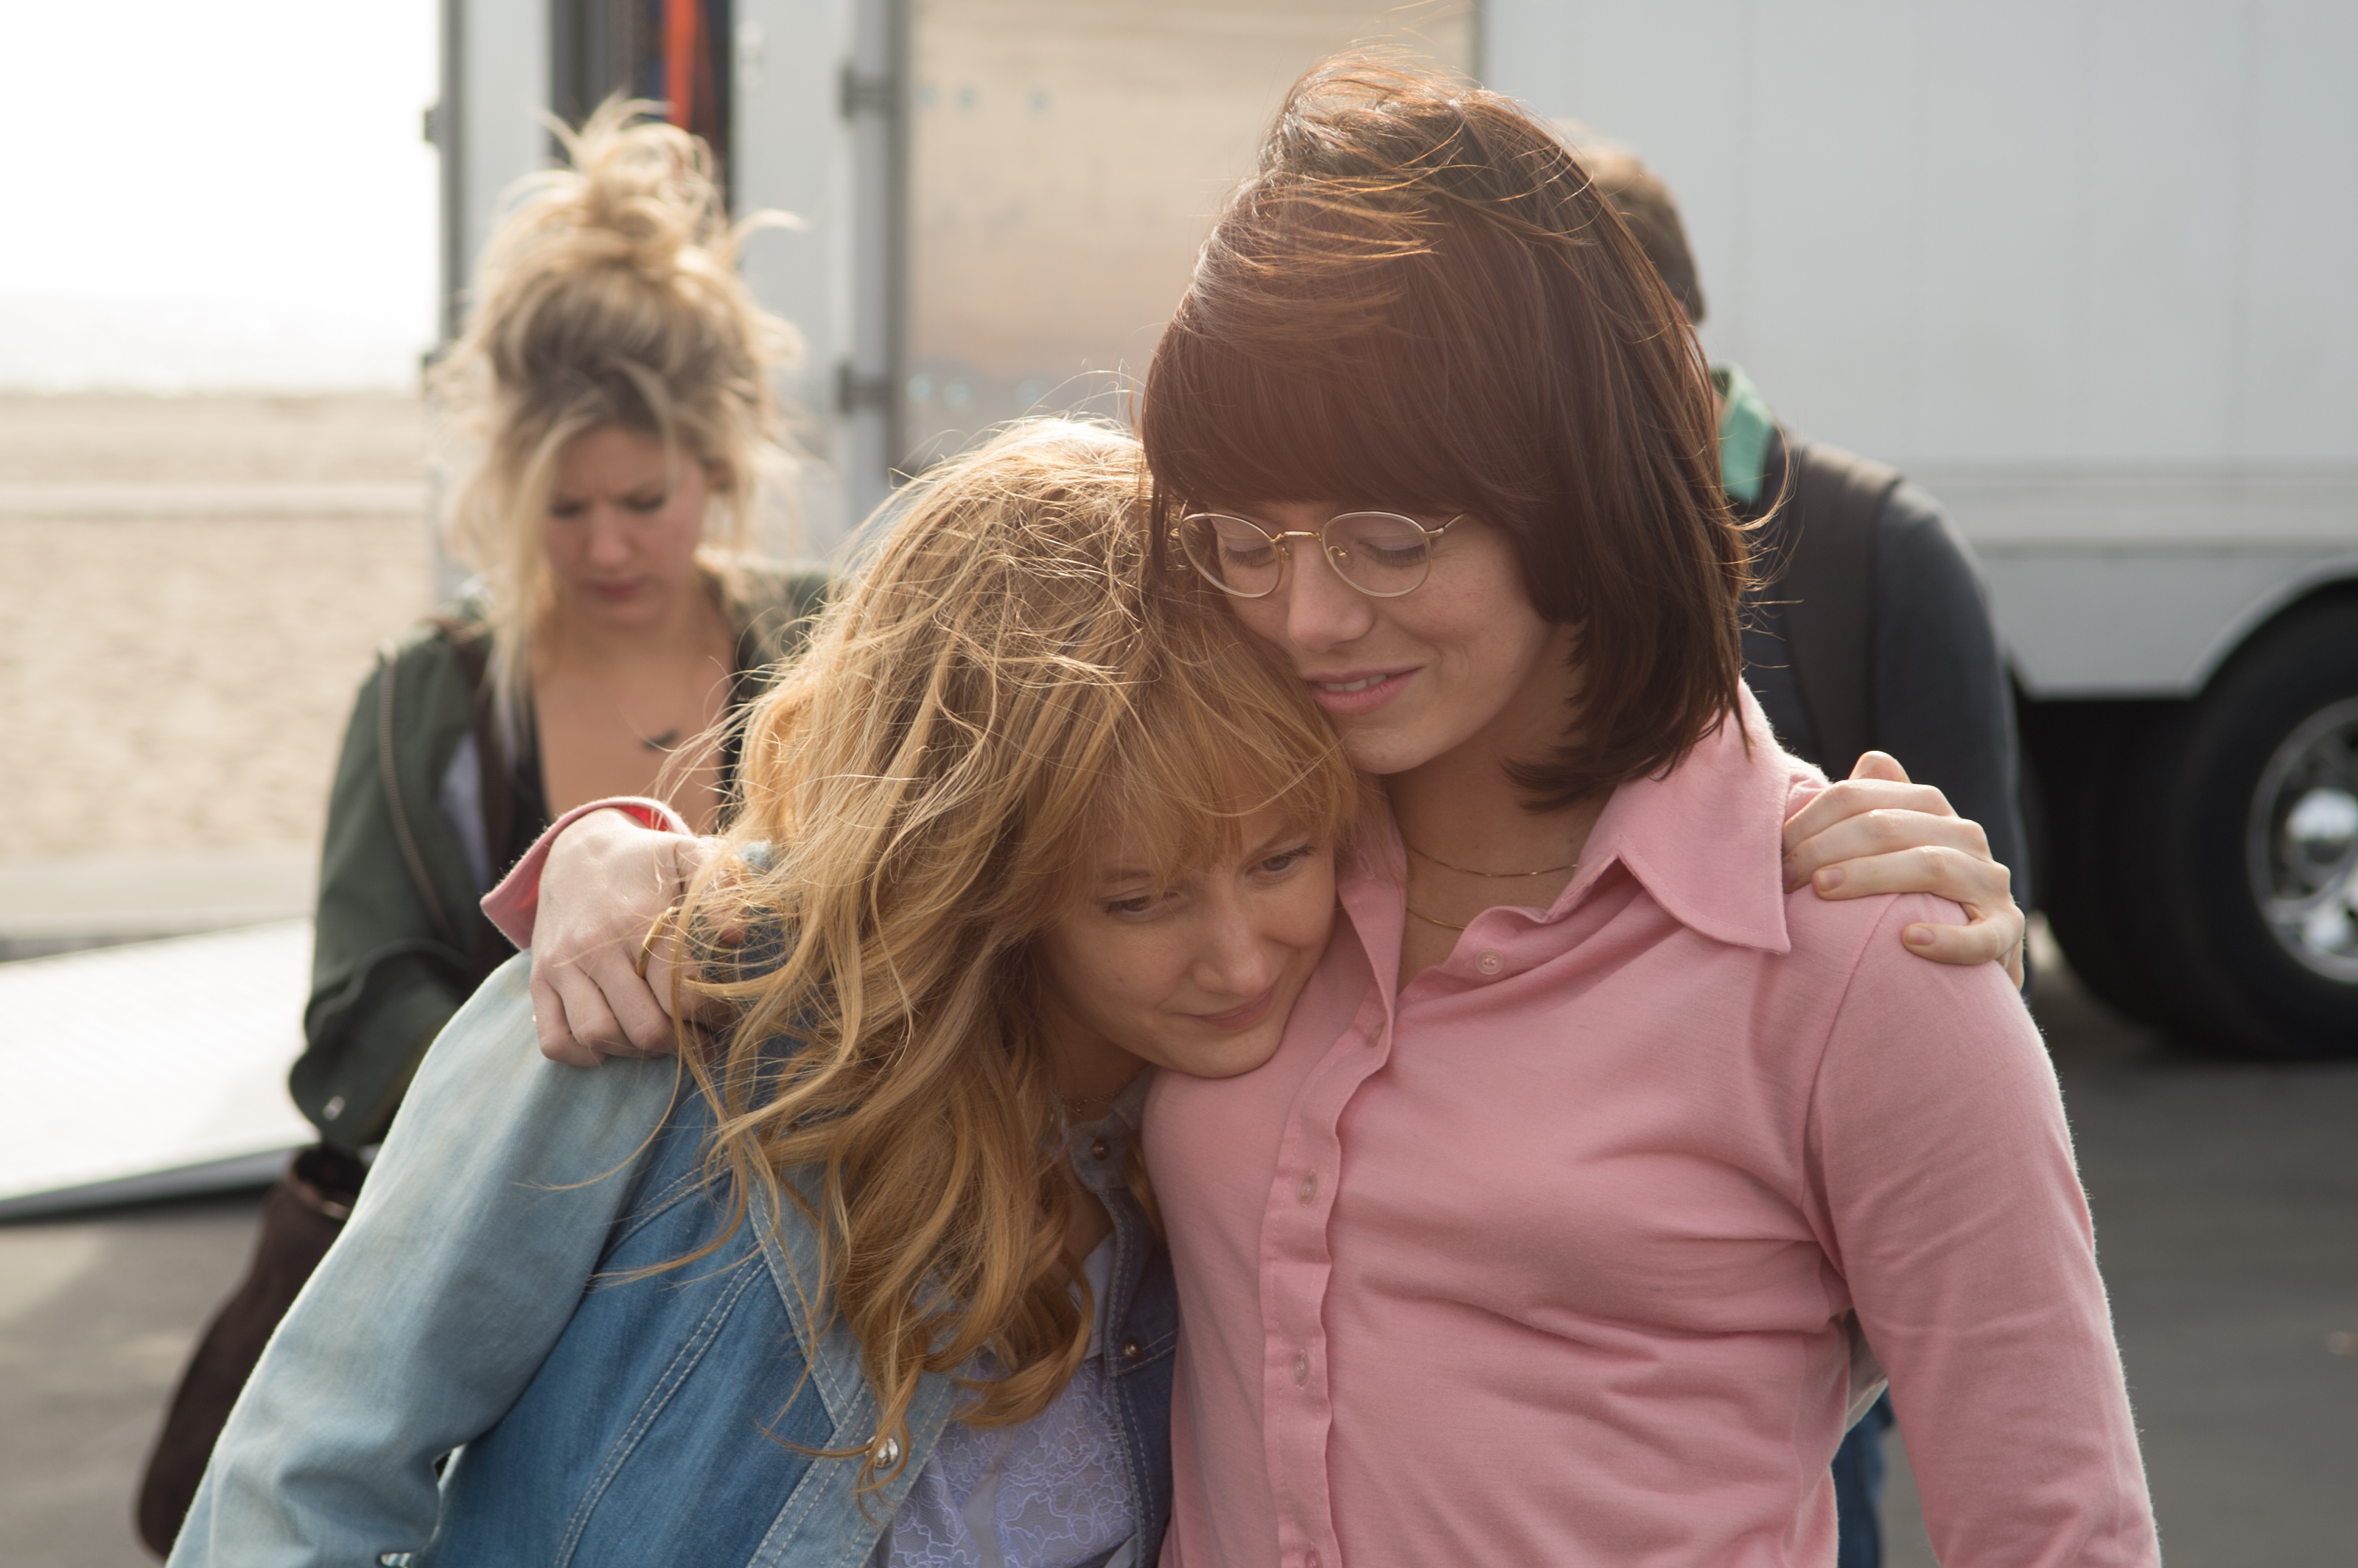 Andrea Riseborough ed Emma Stone nel film <em>La</em> <em>battaglia dei sessi</em>. Photo by Dale Robinette.© 2017 Twentieth Century Fox Film Corporation All Rights ReservedLa battaglia dei sessi